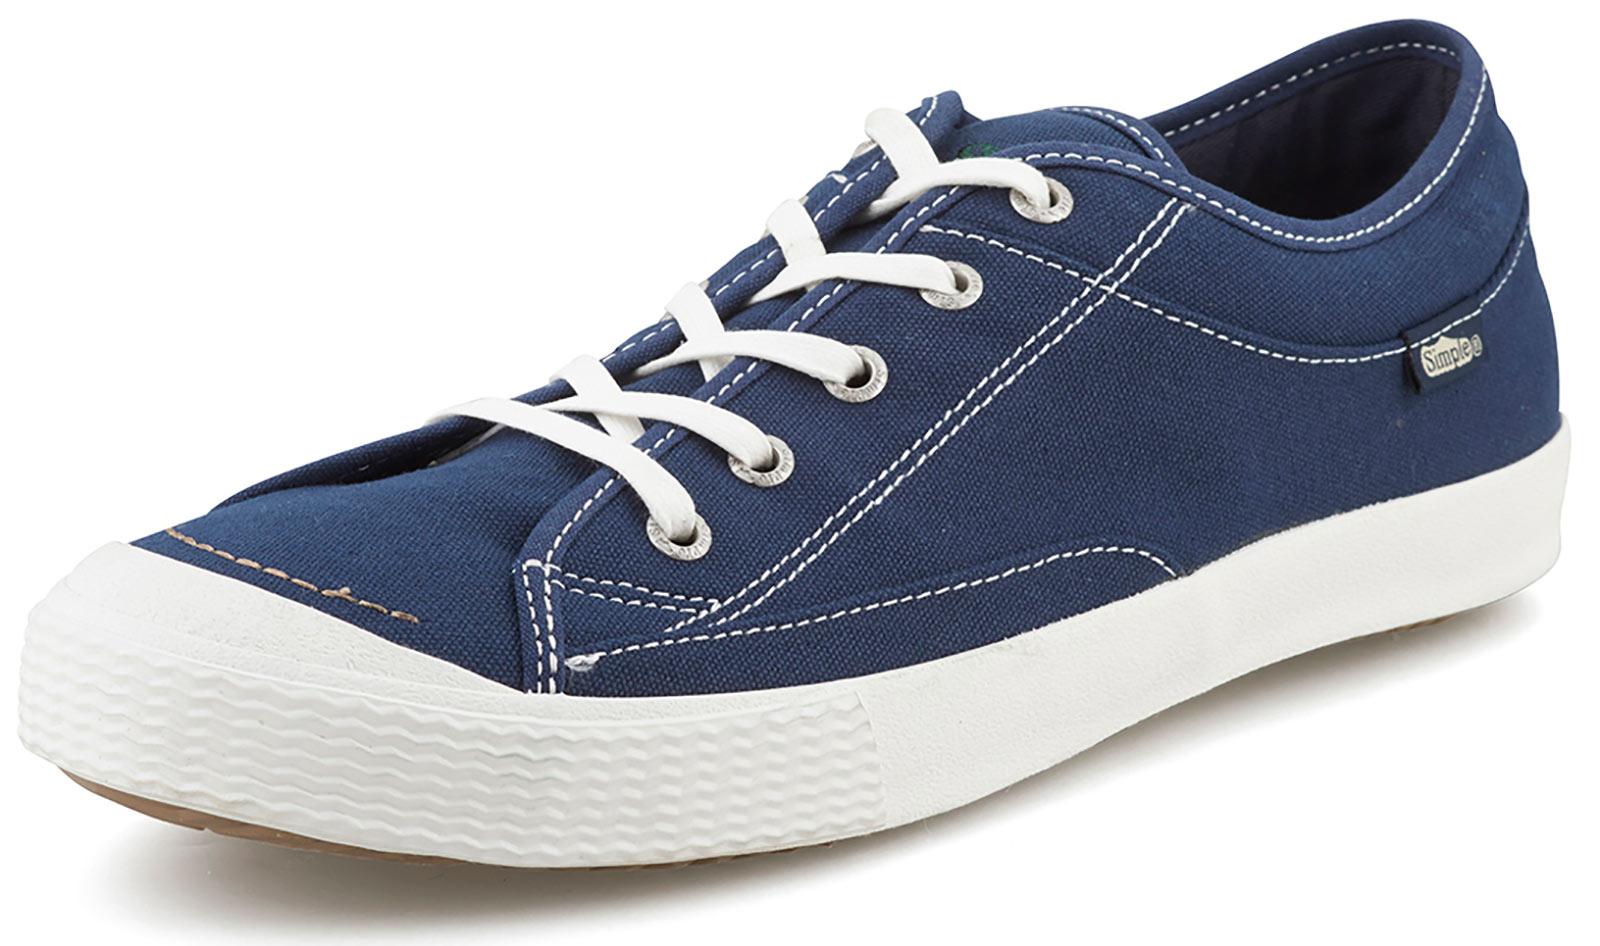 c7dccd4b03339 ... Nike Nike Nike Air Conversion Men s Basketball Shoes Sneakers  861678-004 Gray Size 13 c64883 ...